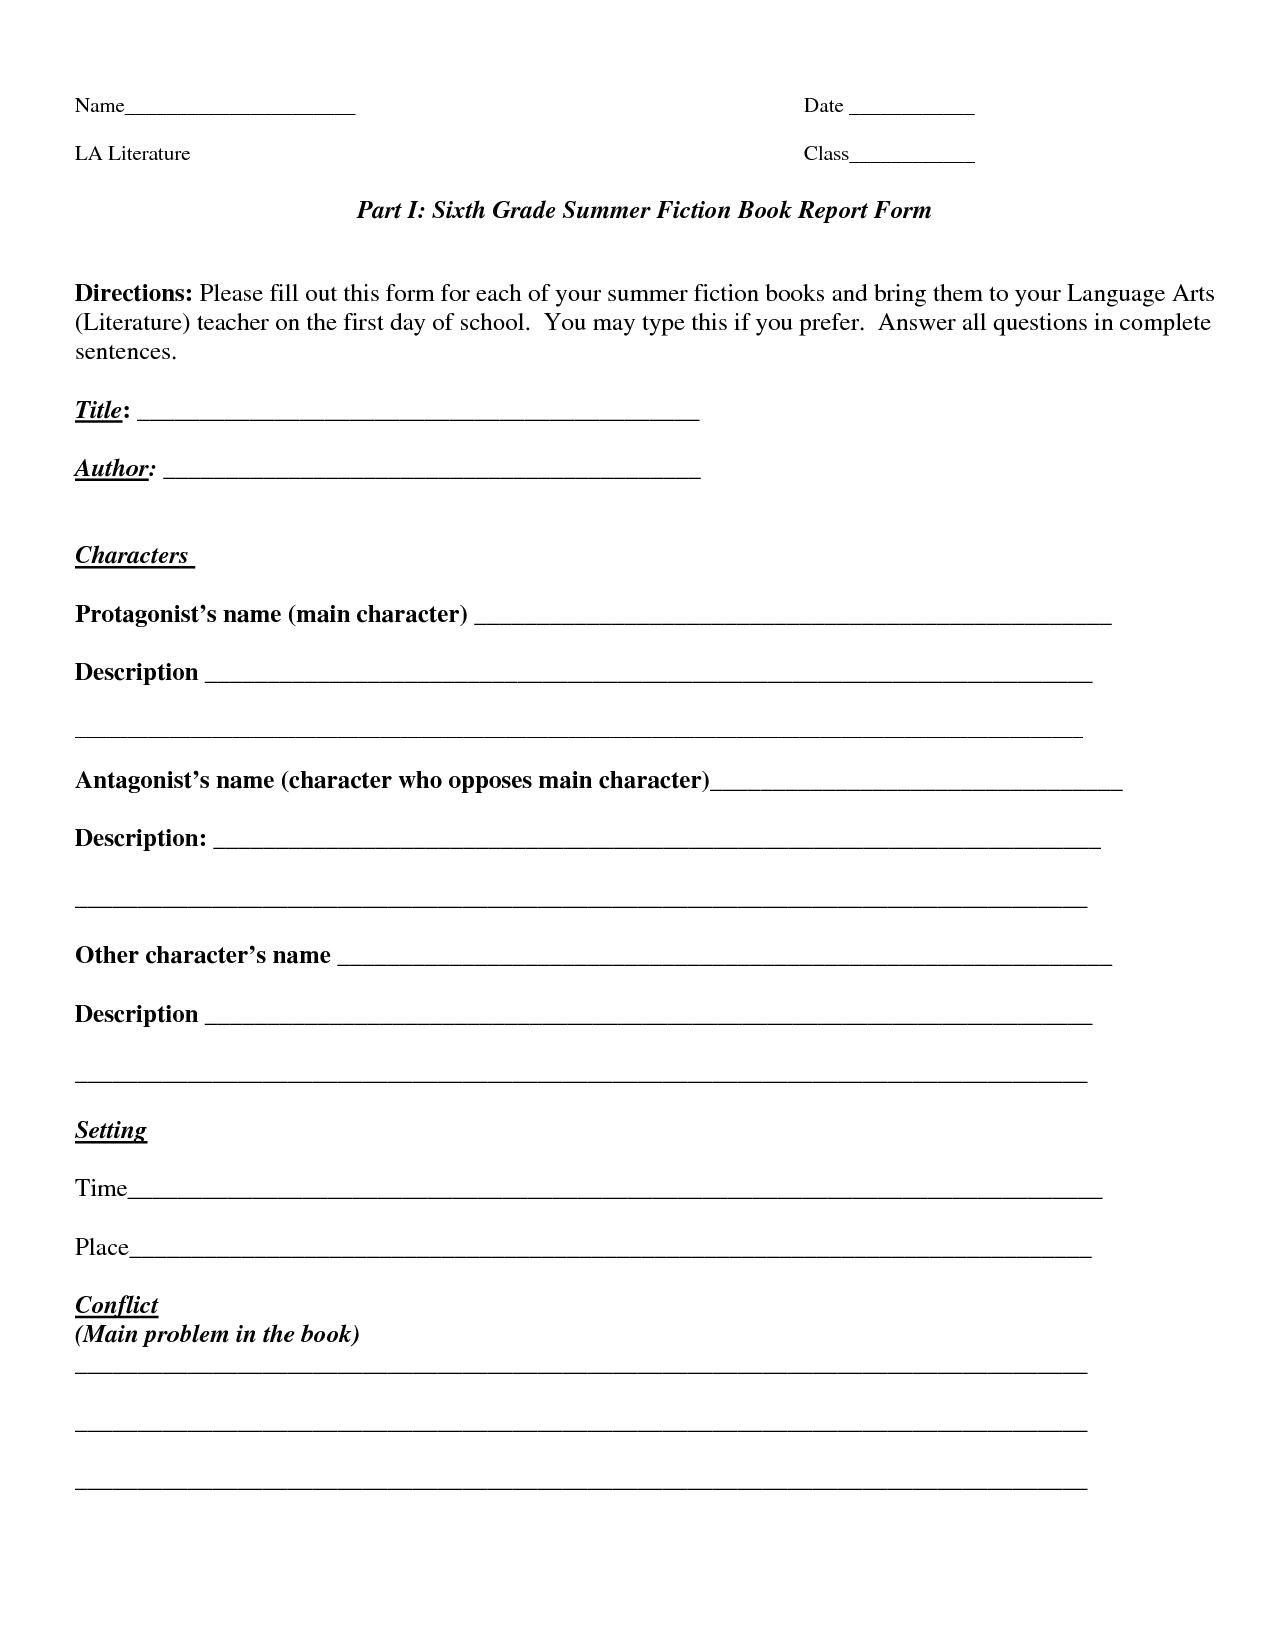 Book Report Template  Part I Sixth Grade Summer Fiction Book Report Inside Book Report Template Grade 1